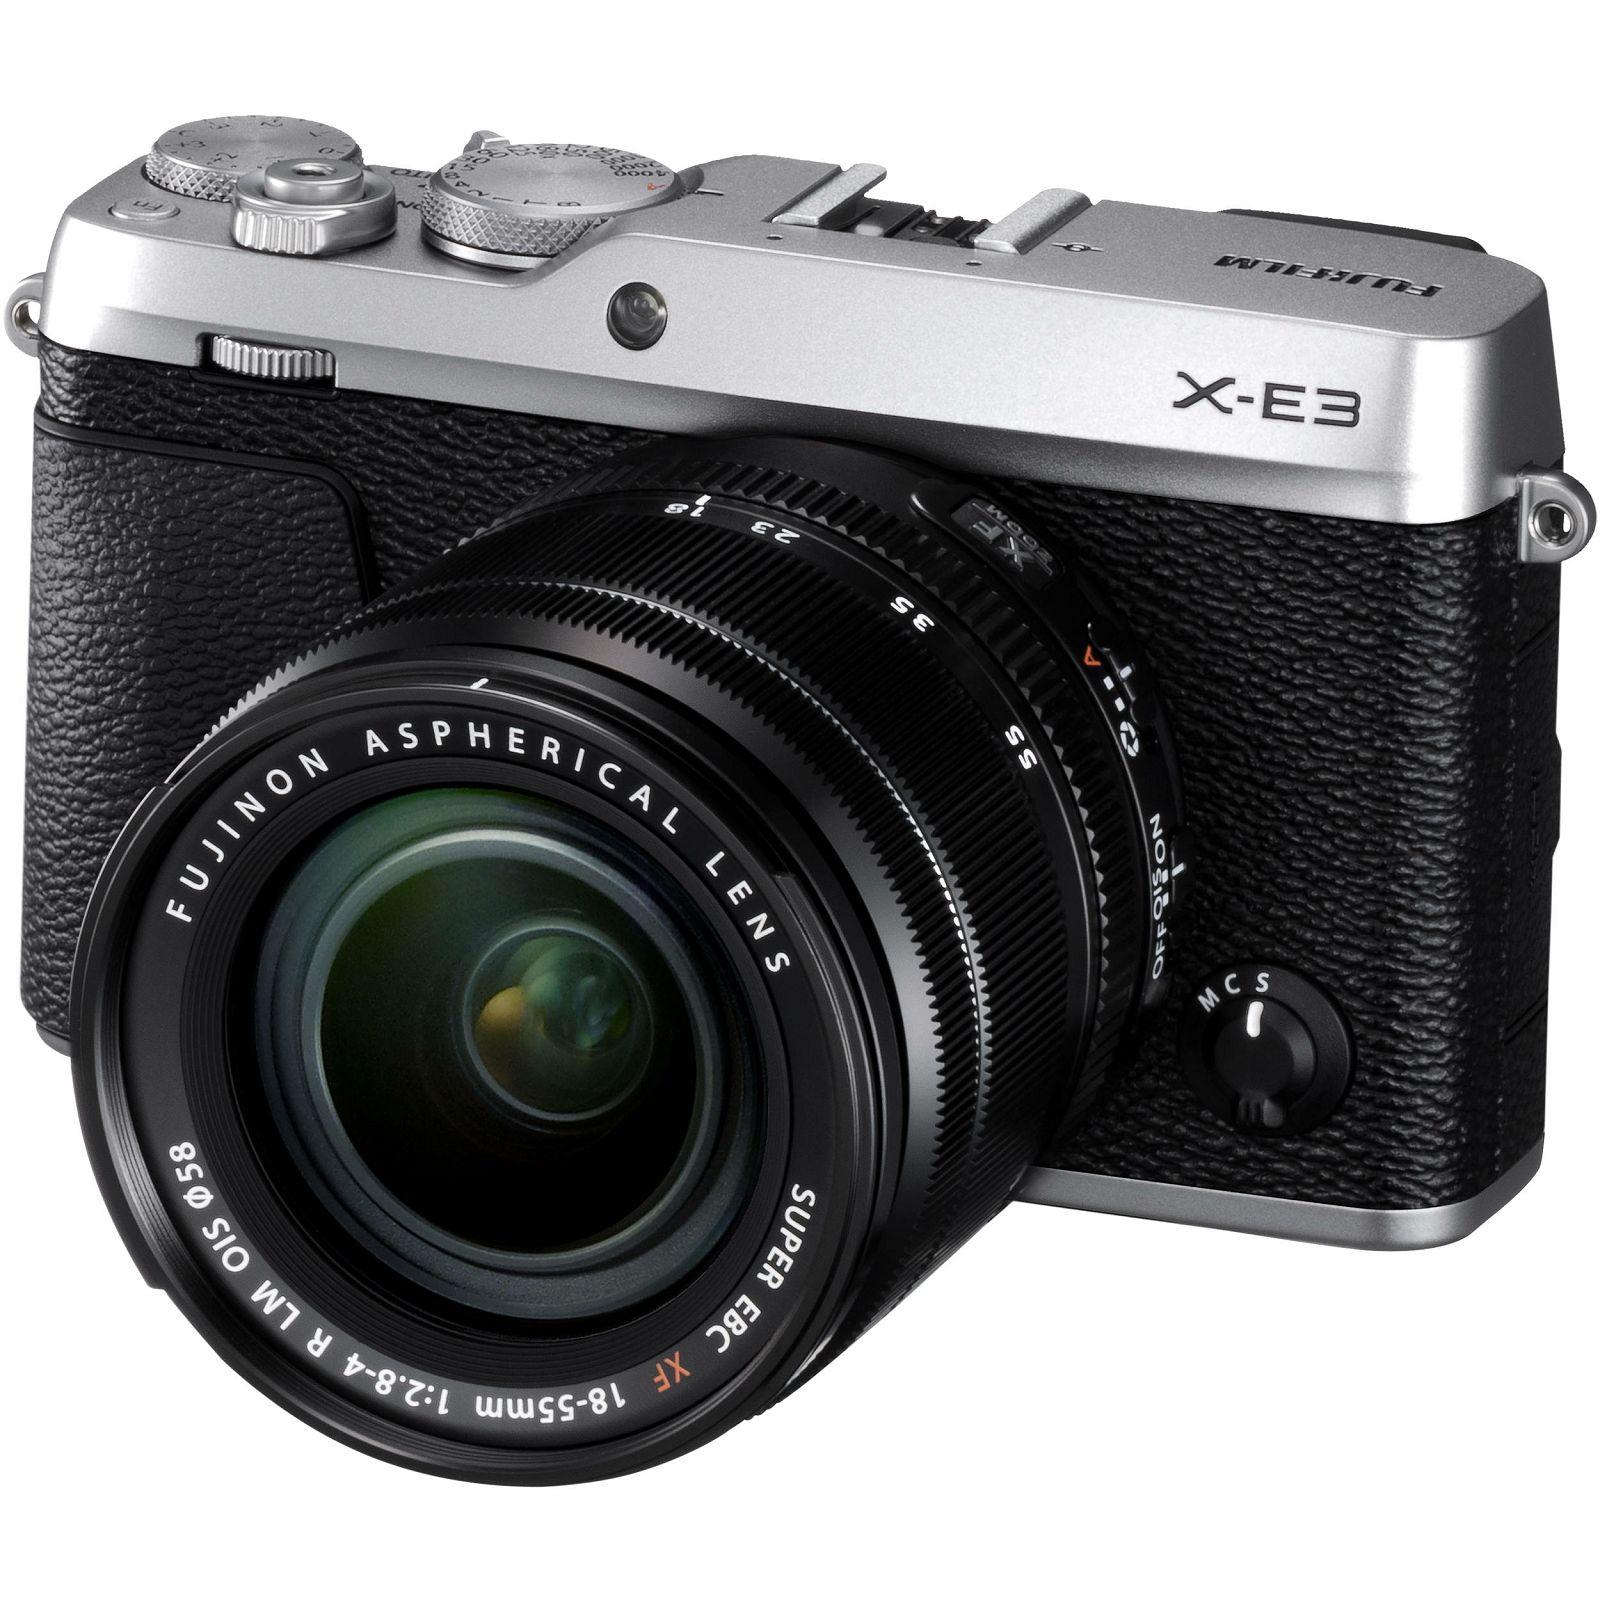 Fujifilm X-E3 + XF 18-55 EE KIT Silver srebreni Digitalni fotoaparat s objektivom XF18-55mm Mirrorless camera Fuji Finepix XE3